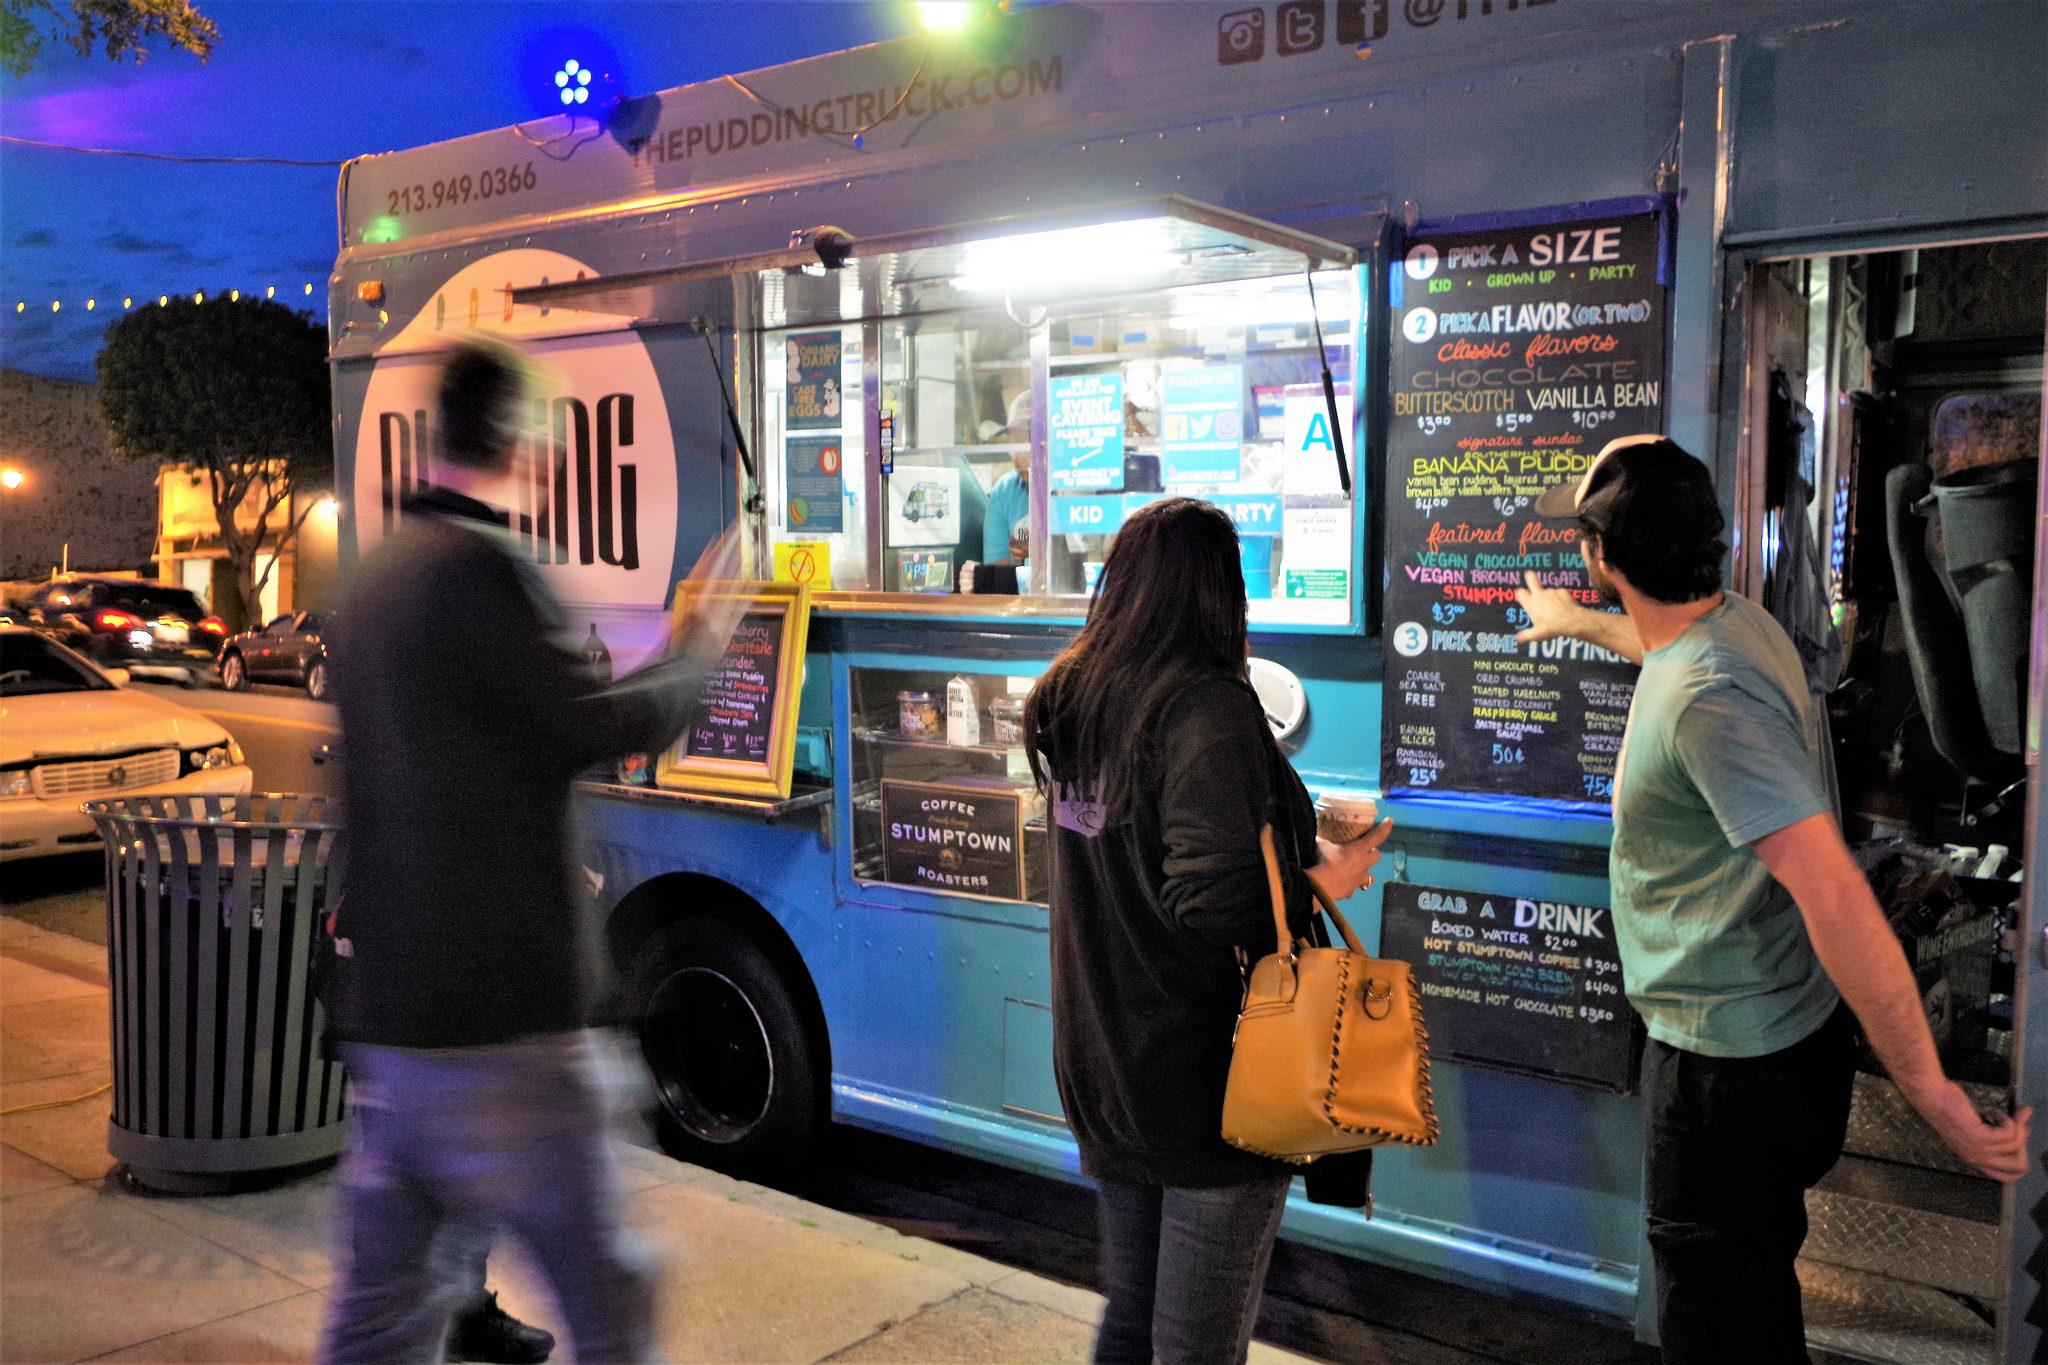 A food truck   © Djoey zanotti/Flickr